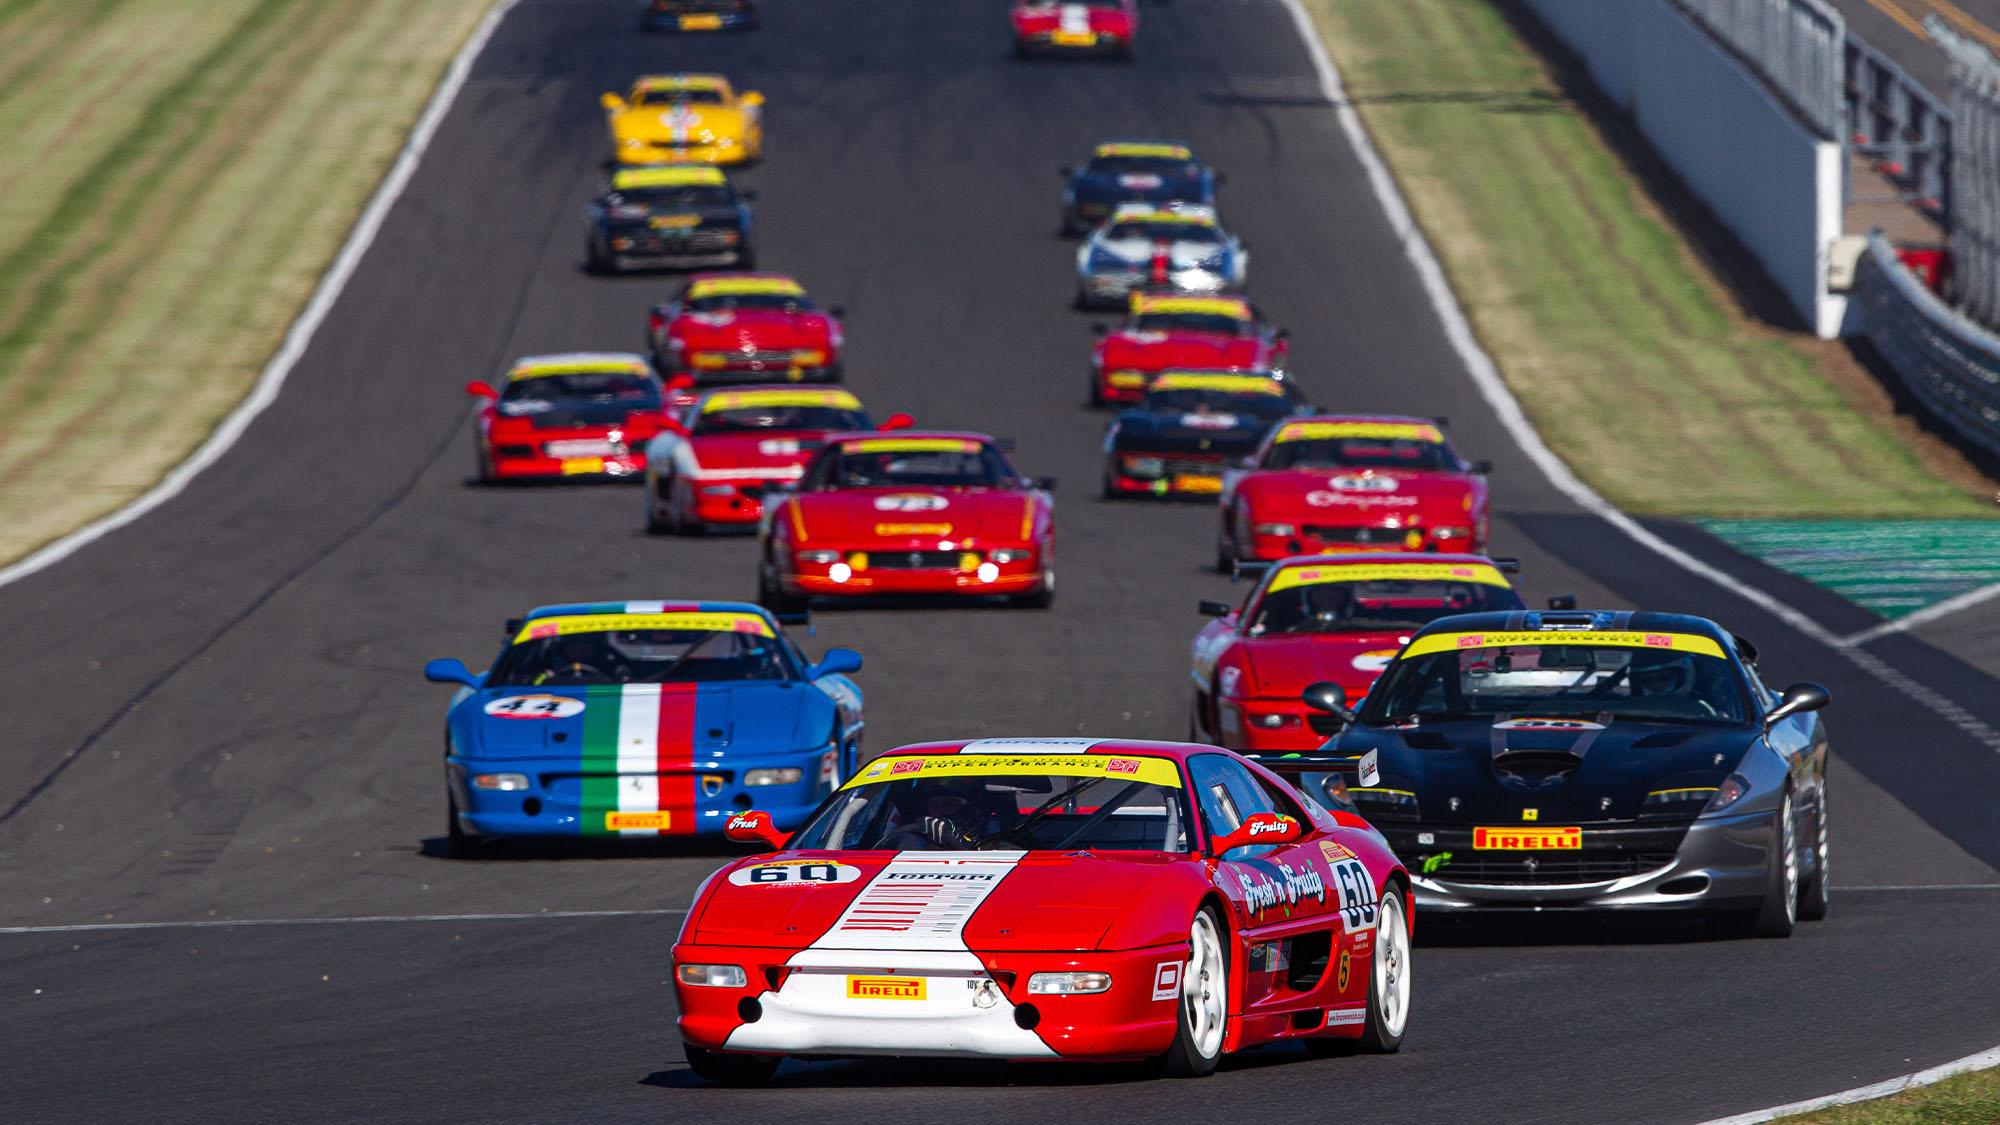 Ferrari lead 2